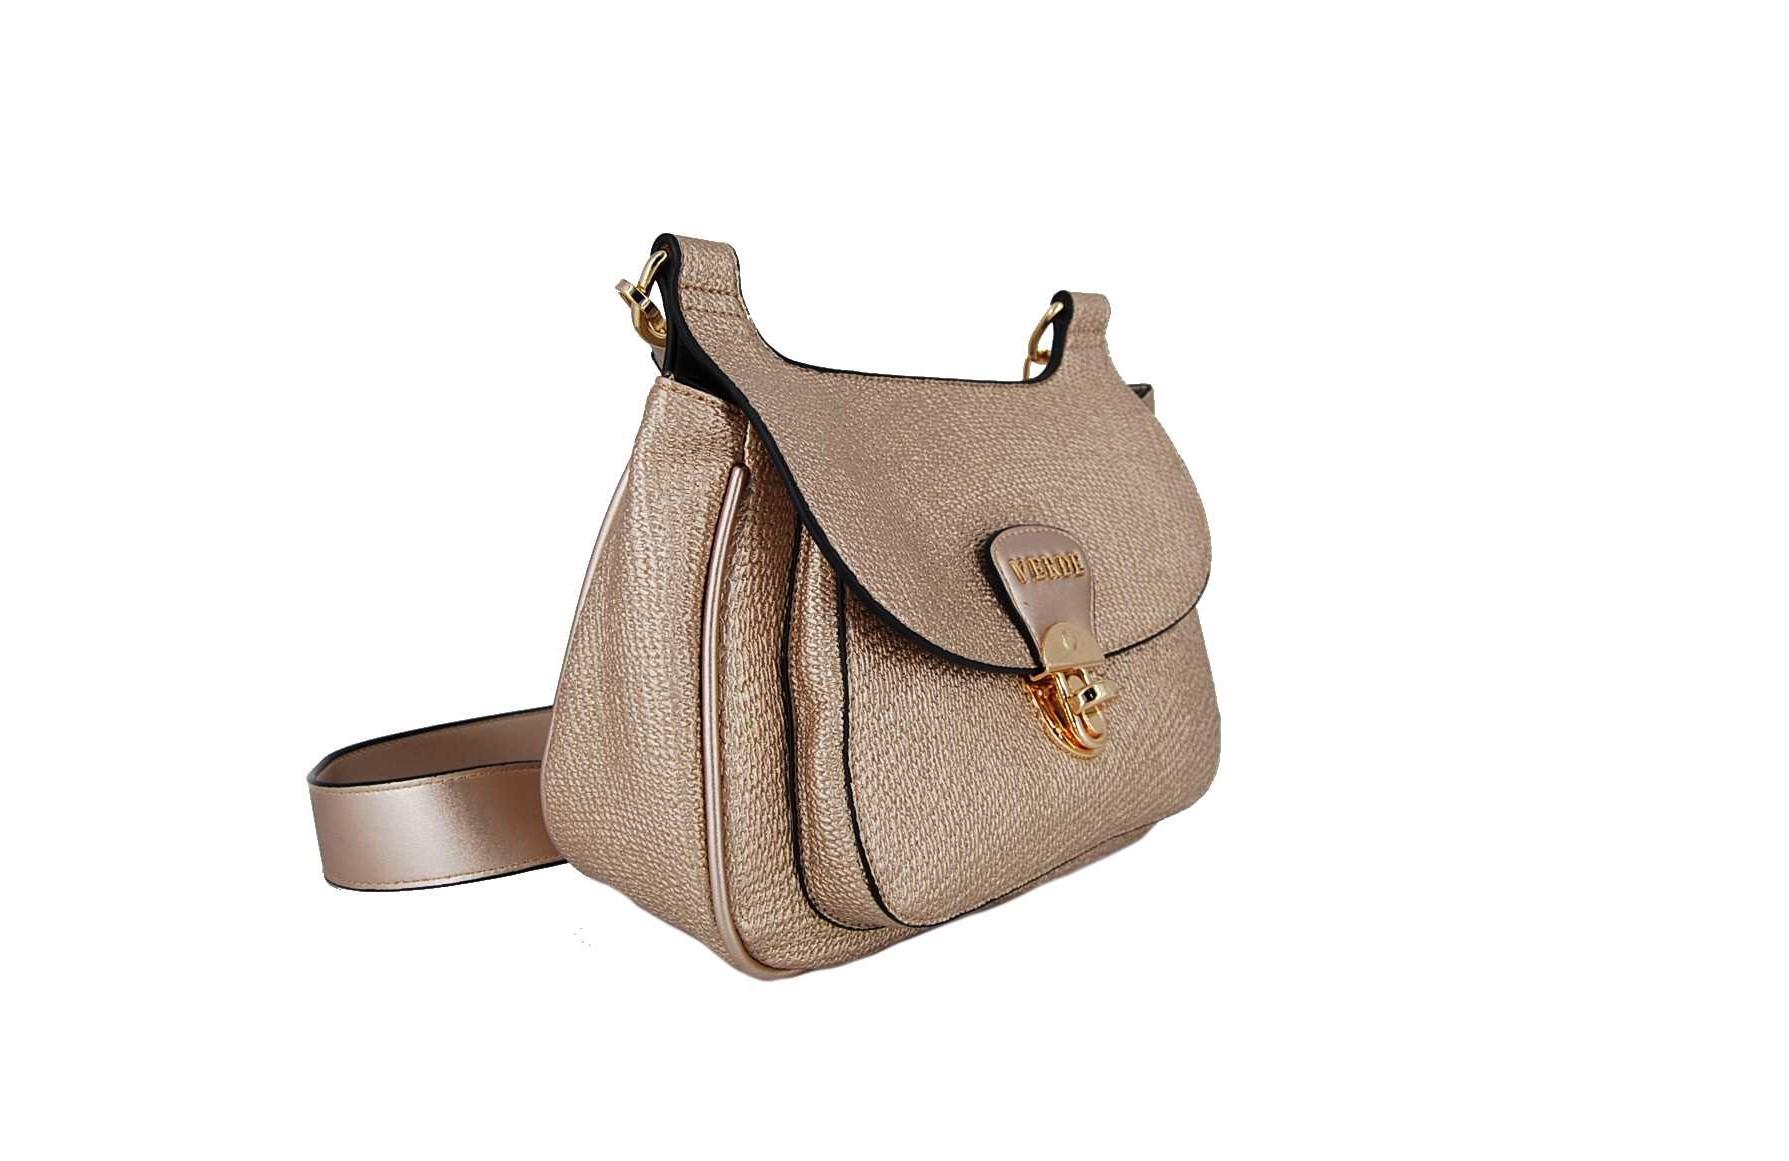 f6593bfcf5 Verde τσάντα γυναικεία χιαστί ροζ-χρυσό